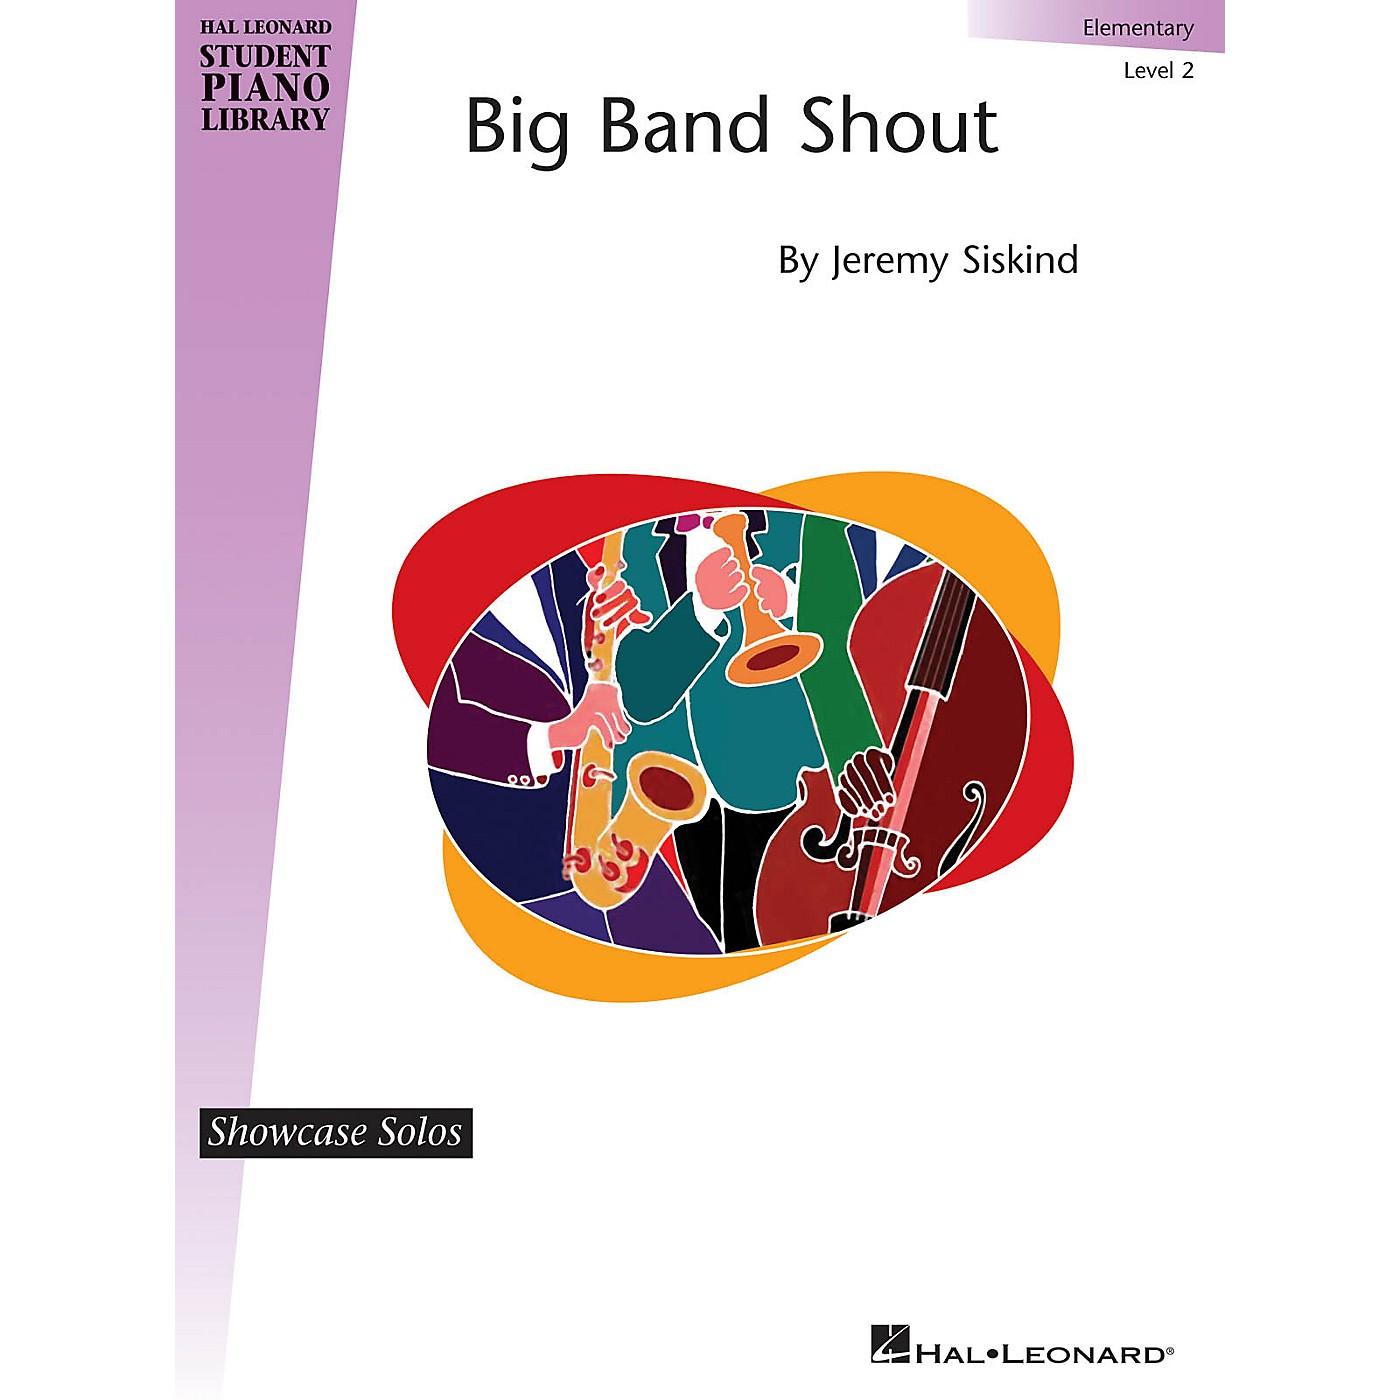 Hal Leonard Big Band Shout Piano Library Series by Jeremy Siskind (Level Elem) thumbnail